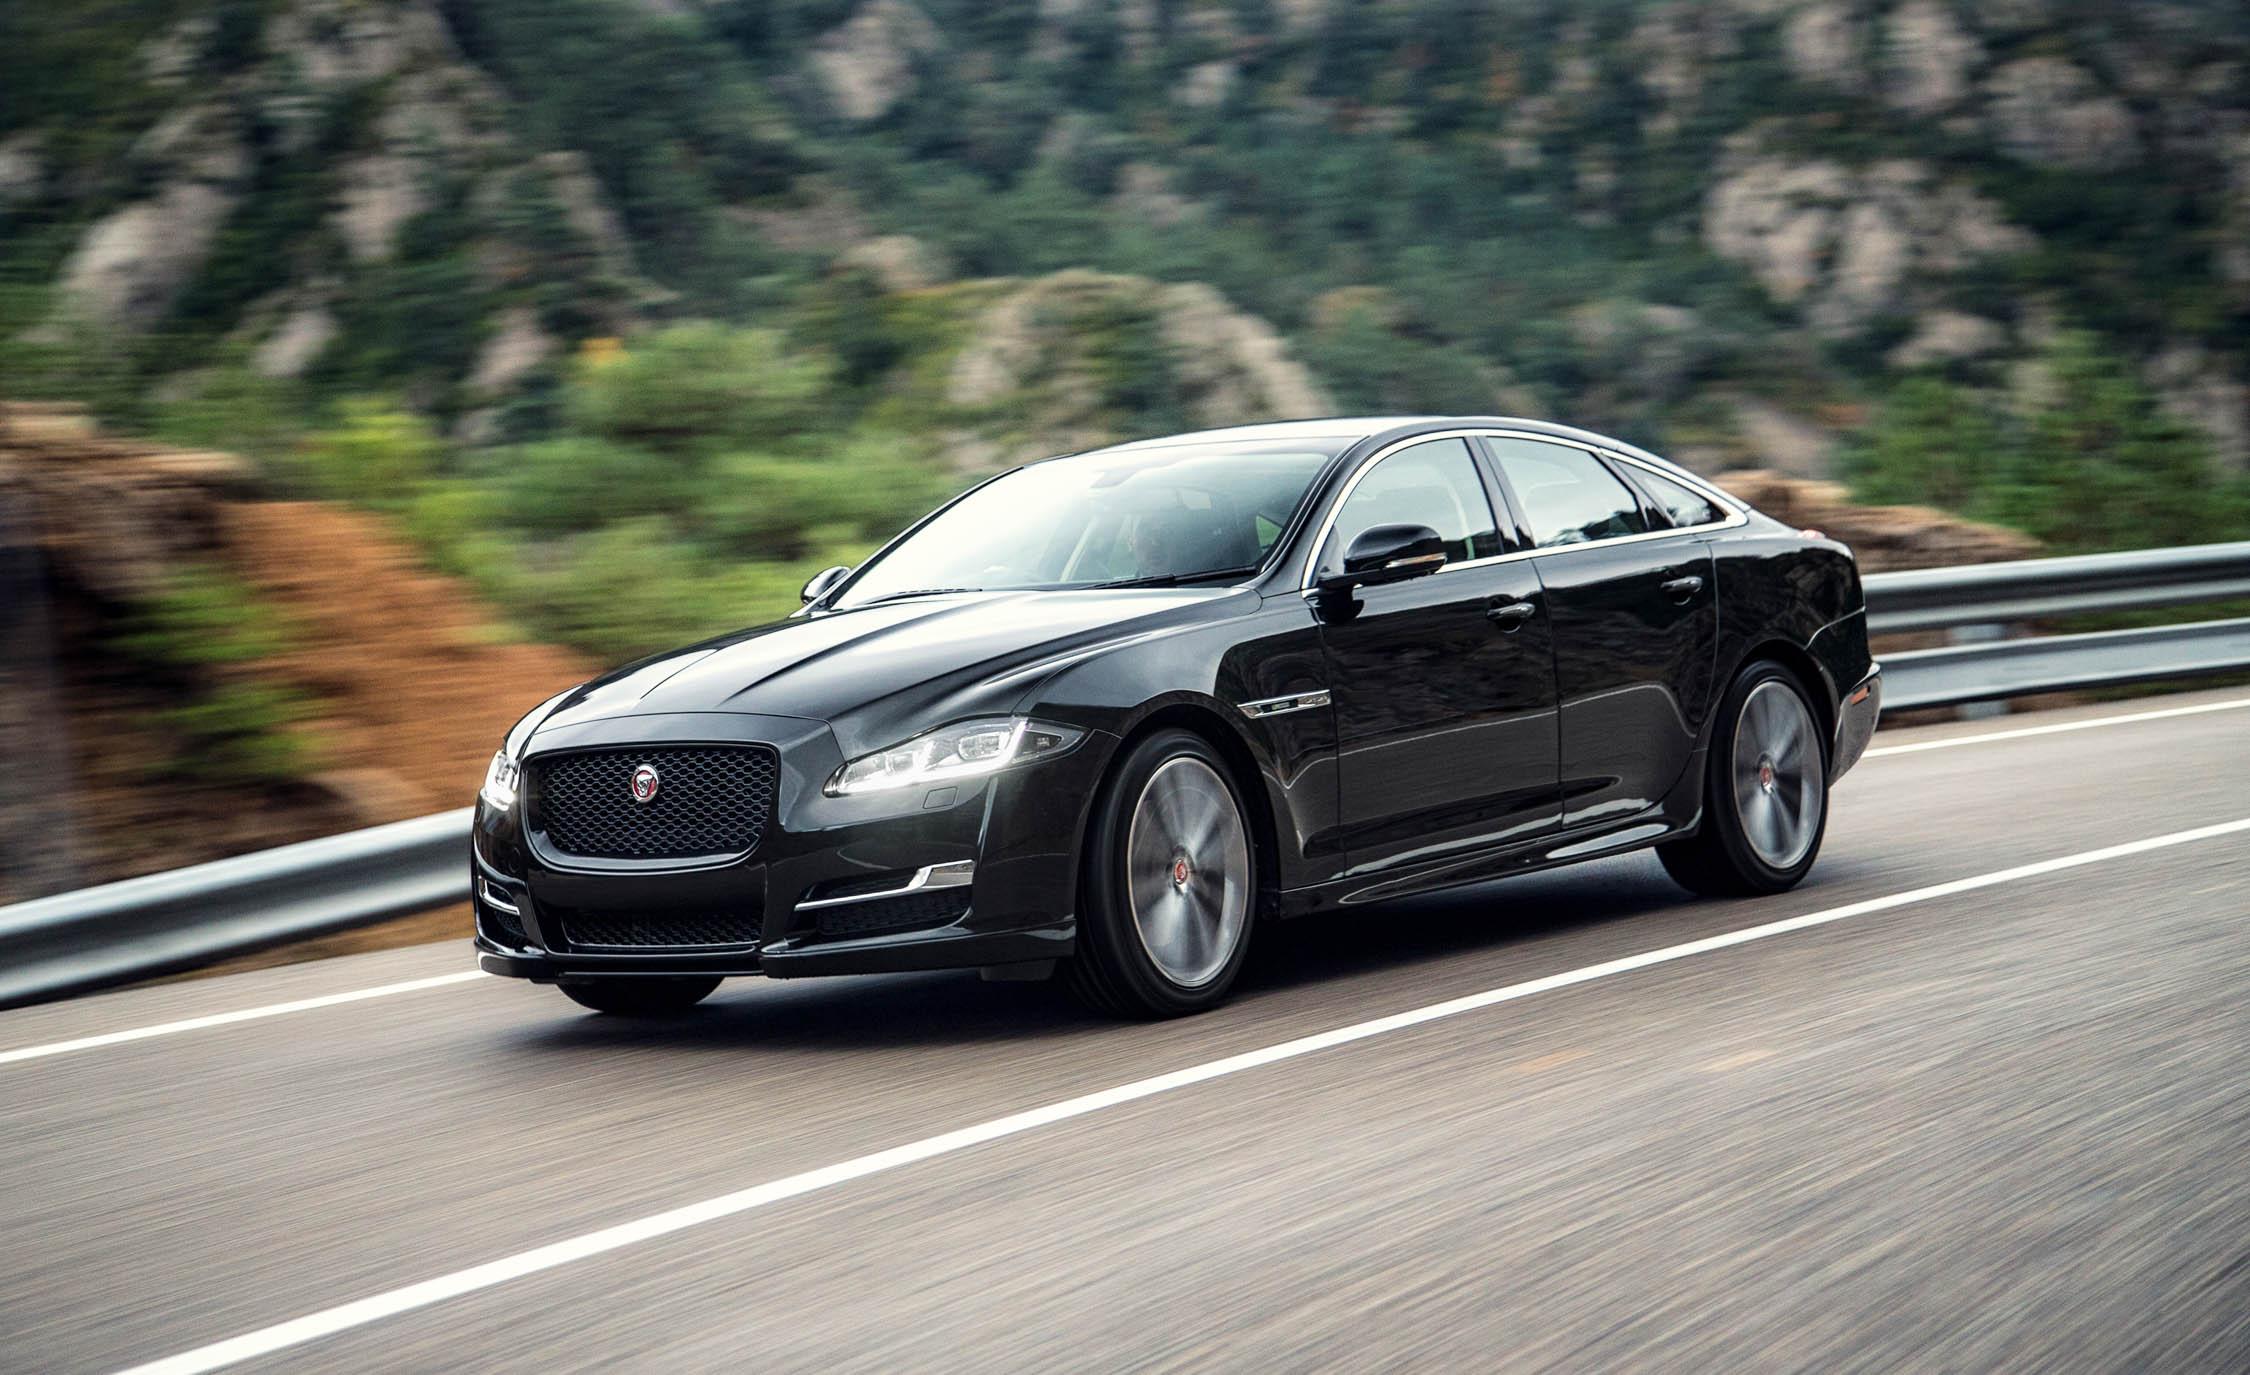 2016 Jaguar XJ Performance